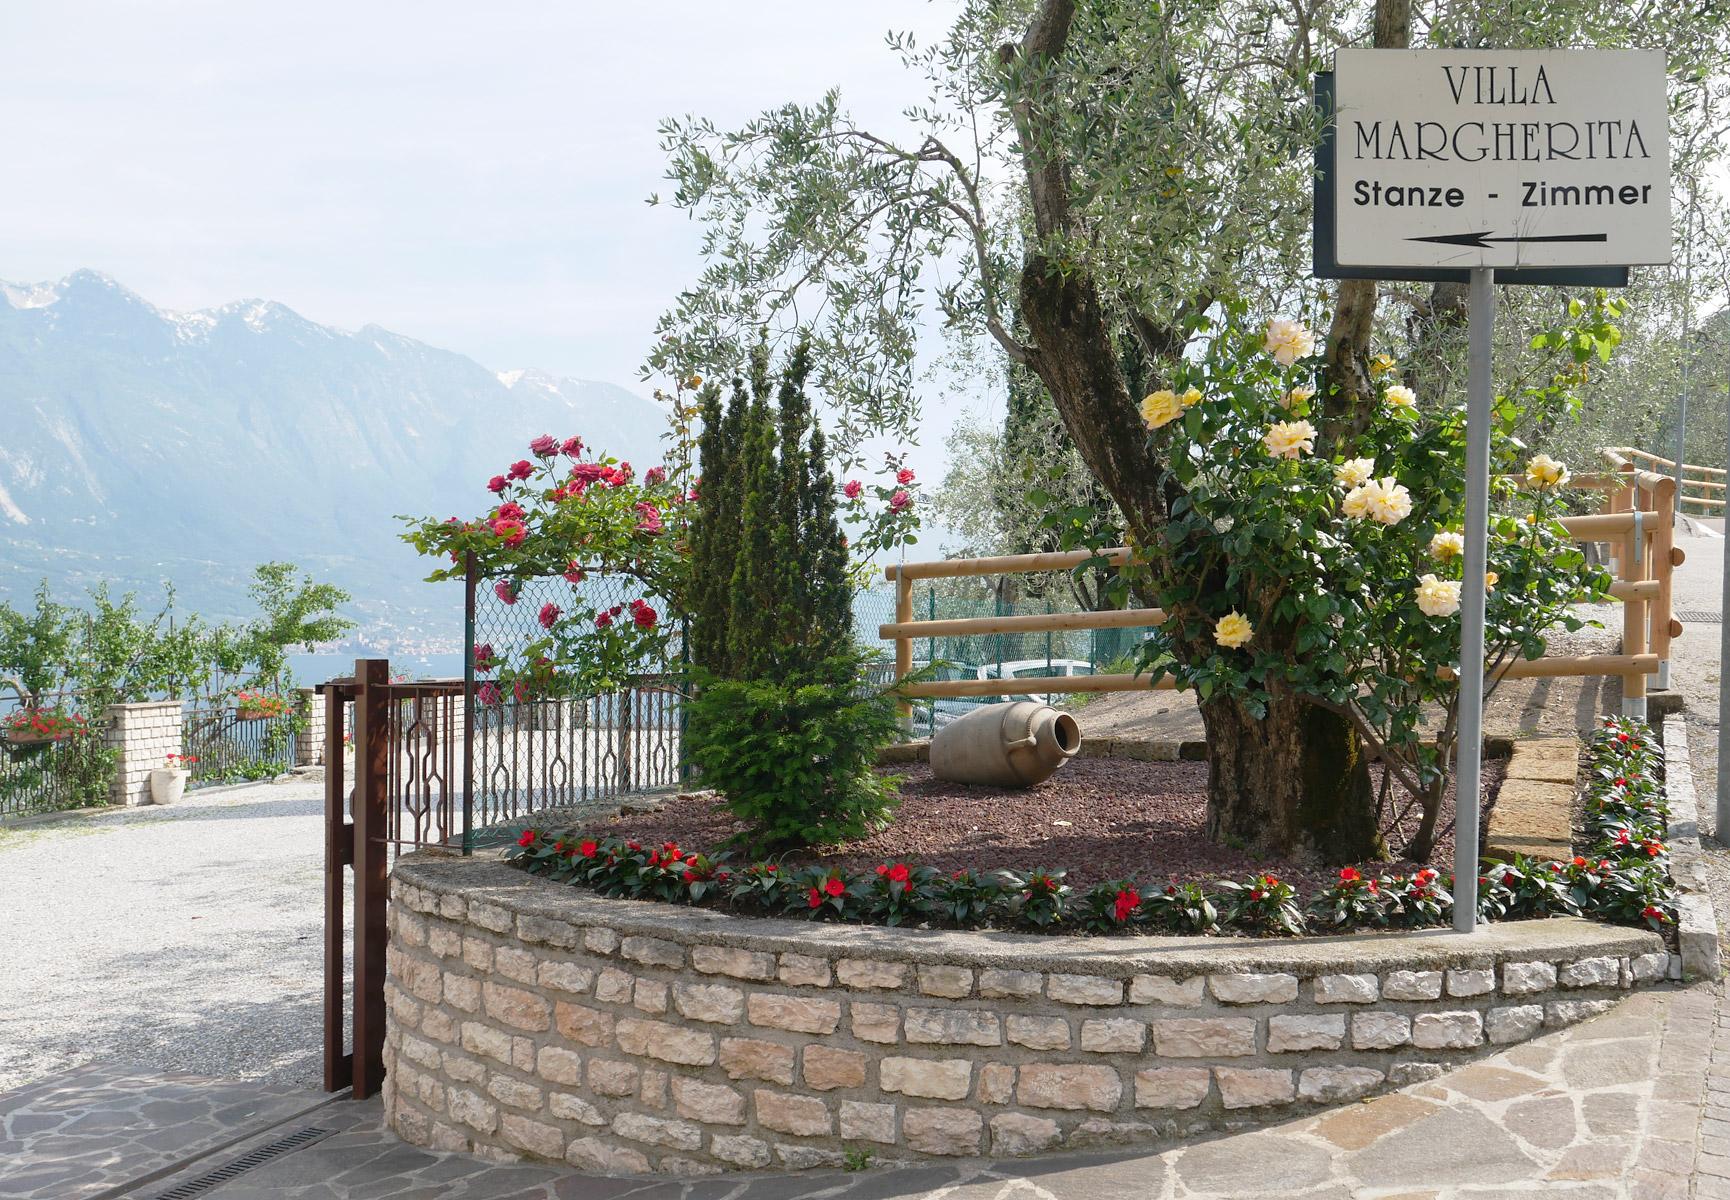 hotel_villa_margherita_limone_giardino3004.jpg